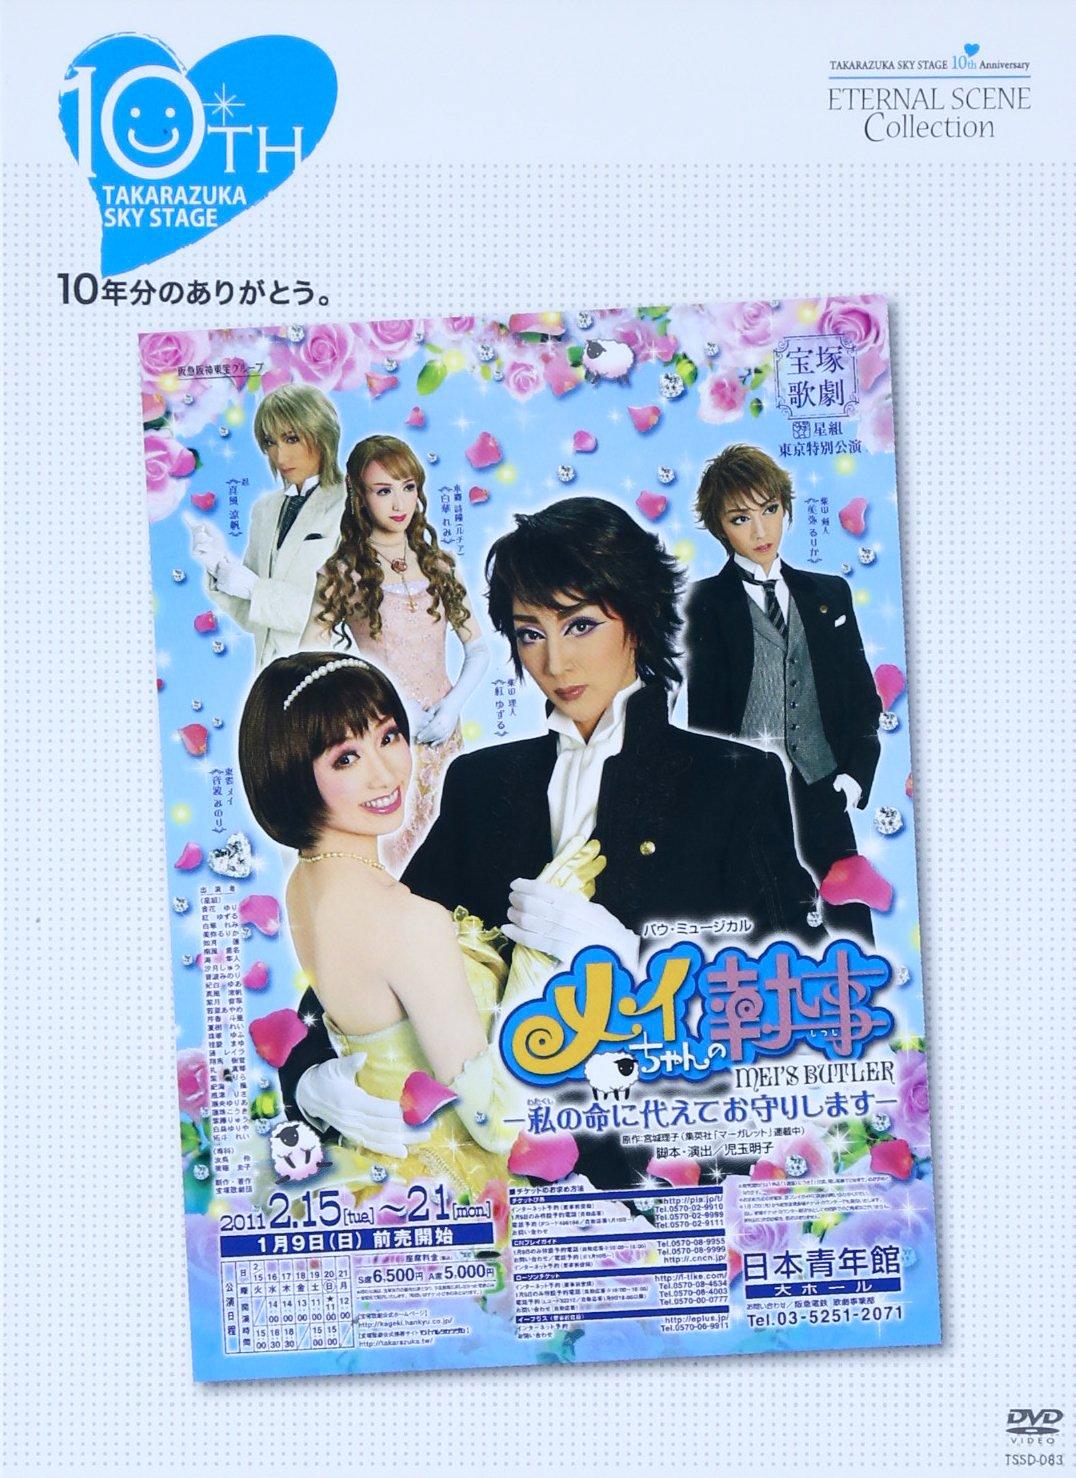 TAKARAZUKA SKY STAGE 10th Anniversary Eternal Scene Collection「メイちゃんの執事」 [DVD] B00FAJ5ET8